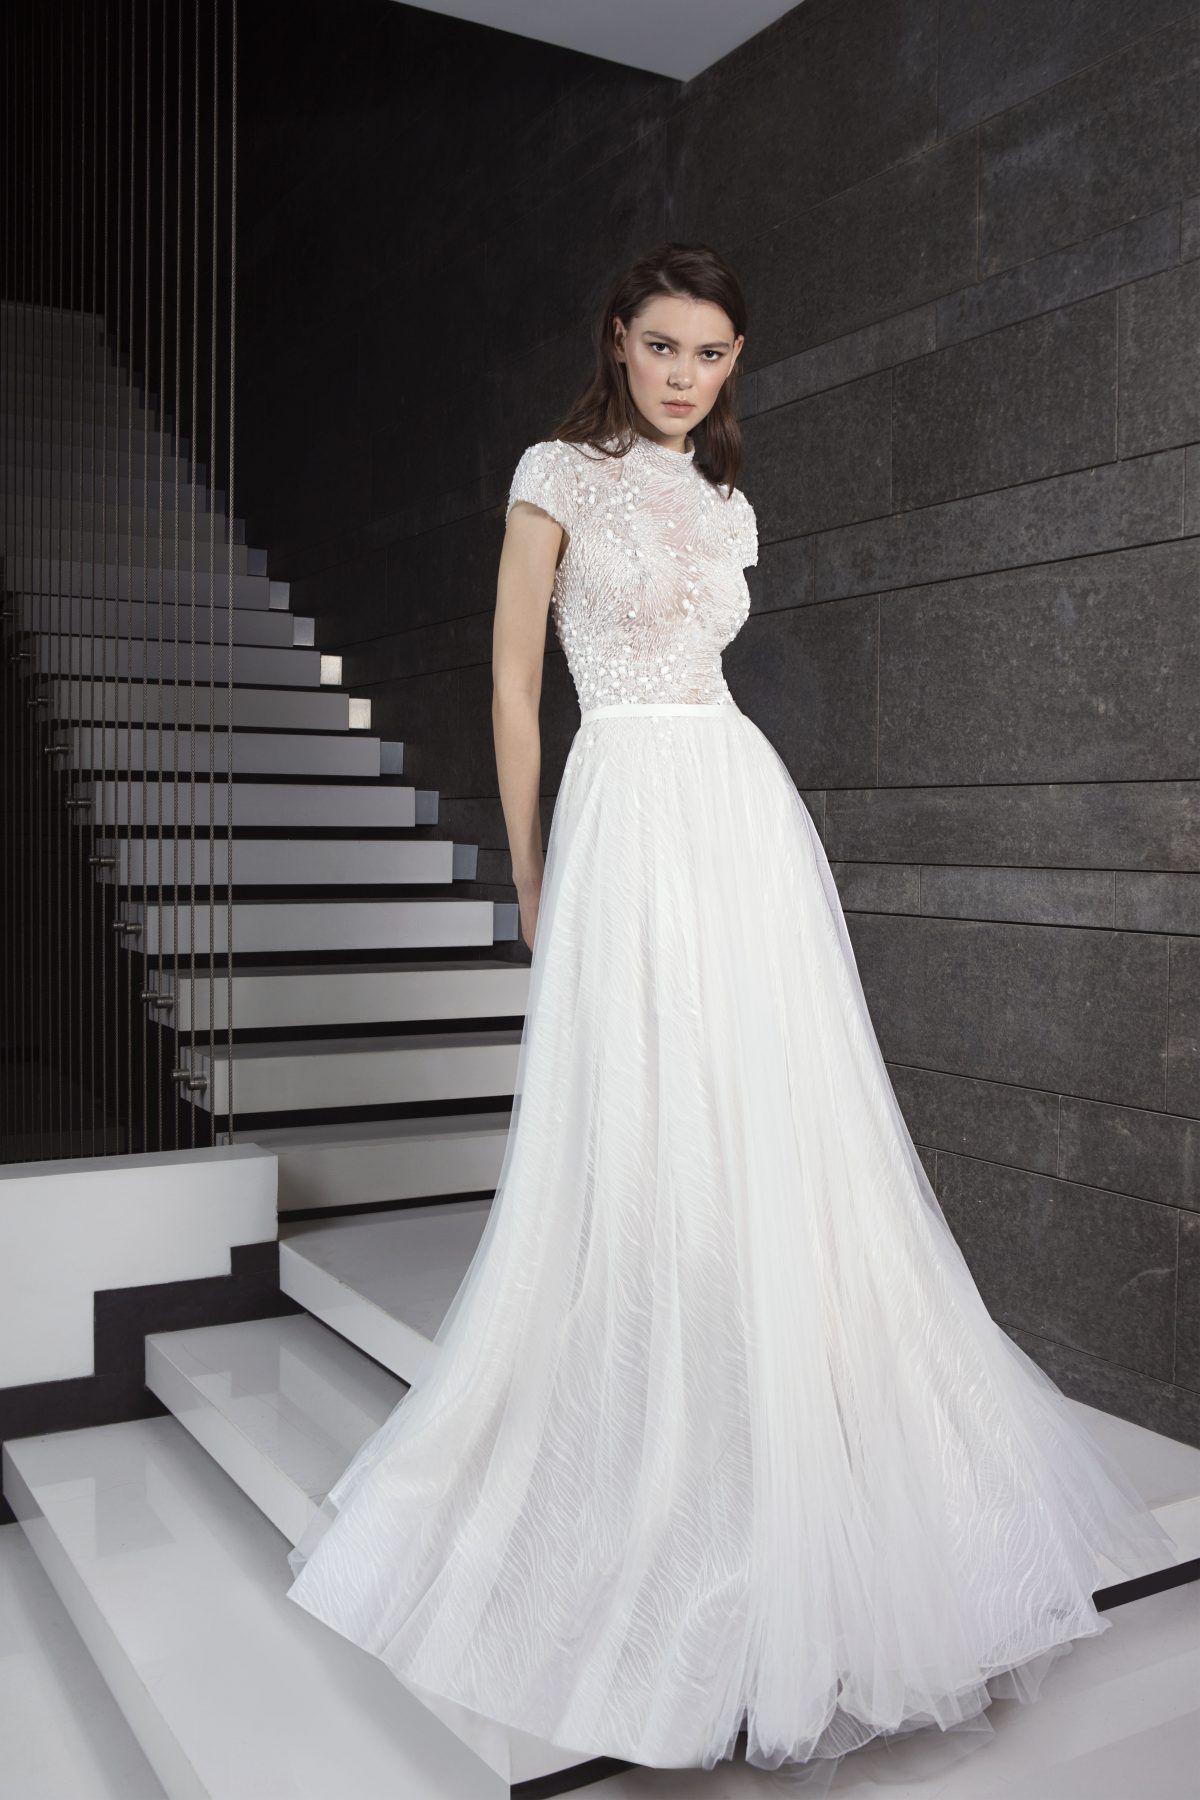 Beaded Short Sleeve Bodice With A Line Tulle Skirt Wedding Dress Tony Ward Tulle Skirt Wedding Dress Short Sleeve Wedding Dress Tony Ward Wedding Dresses [ 1800 x 1200 Pixel ]